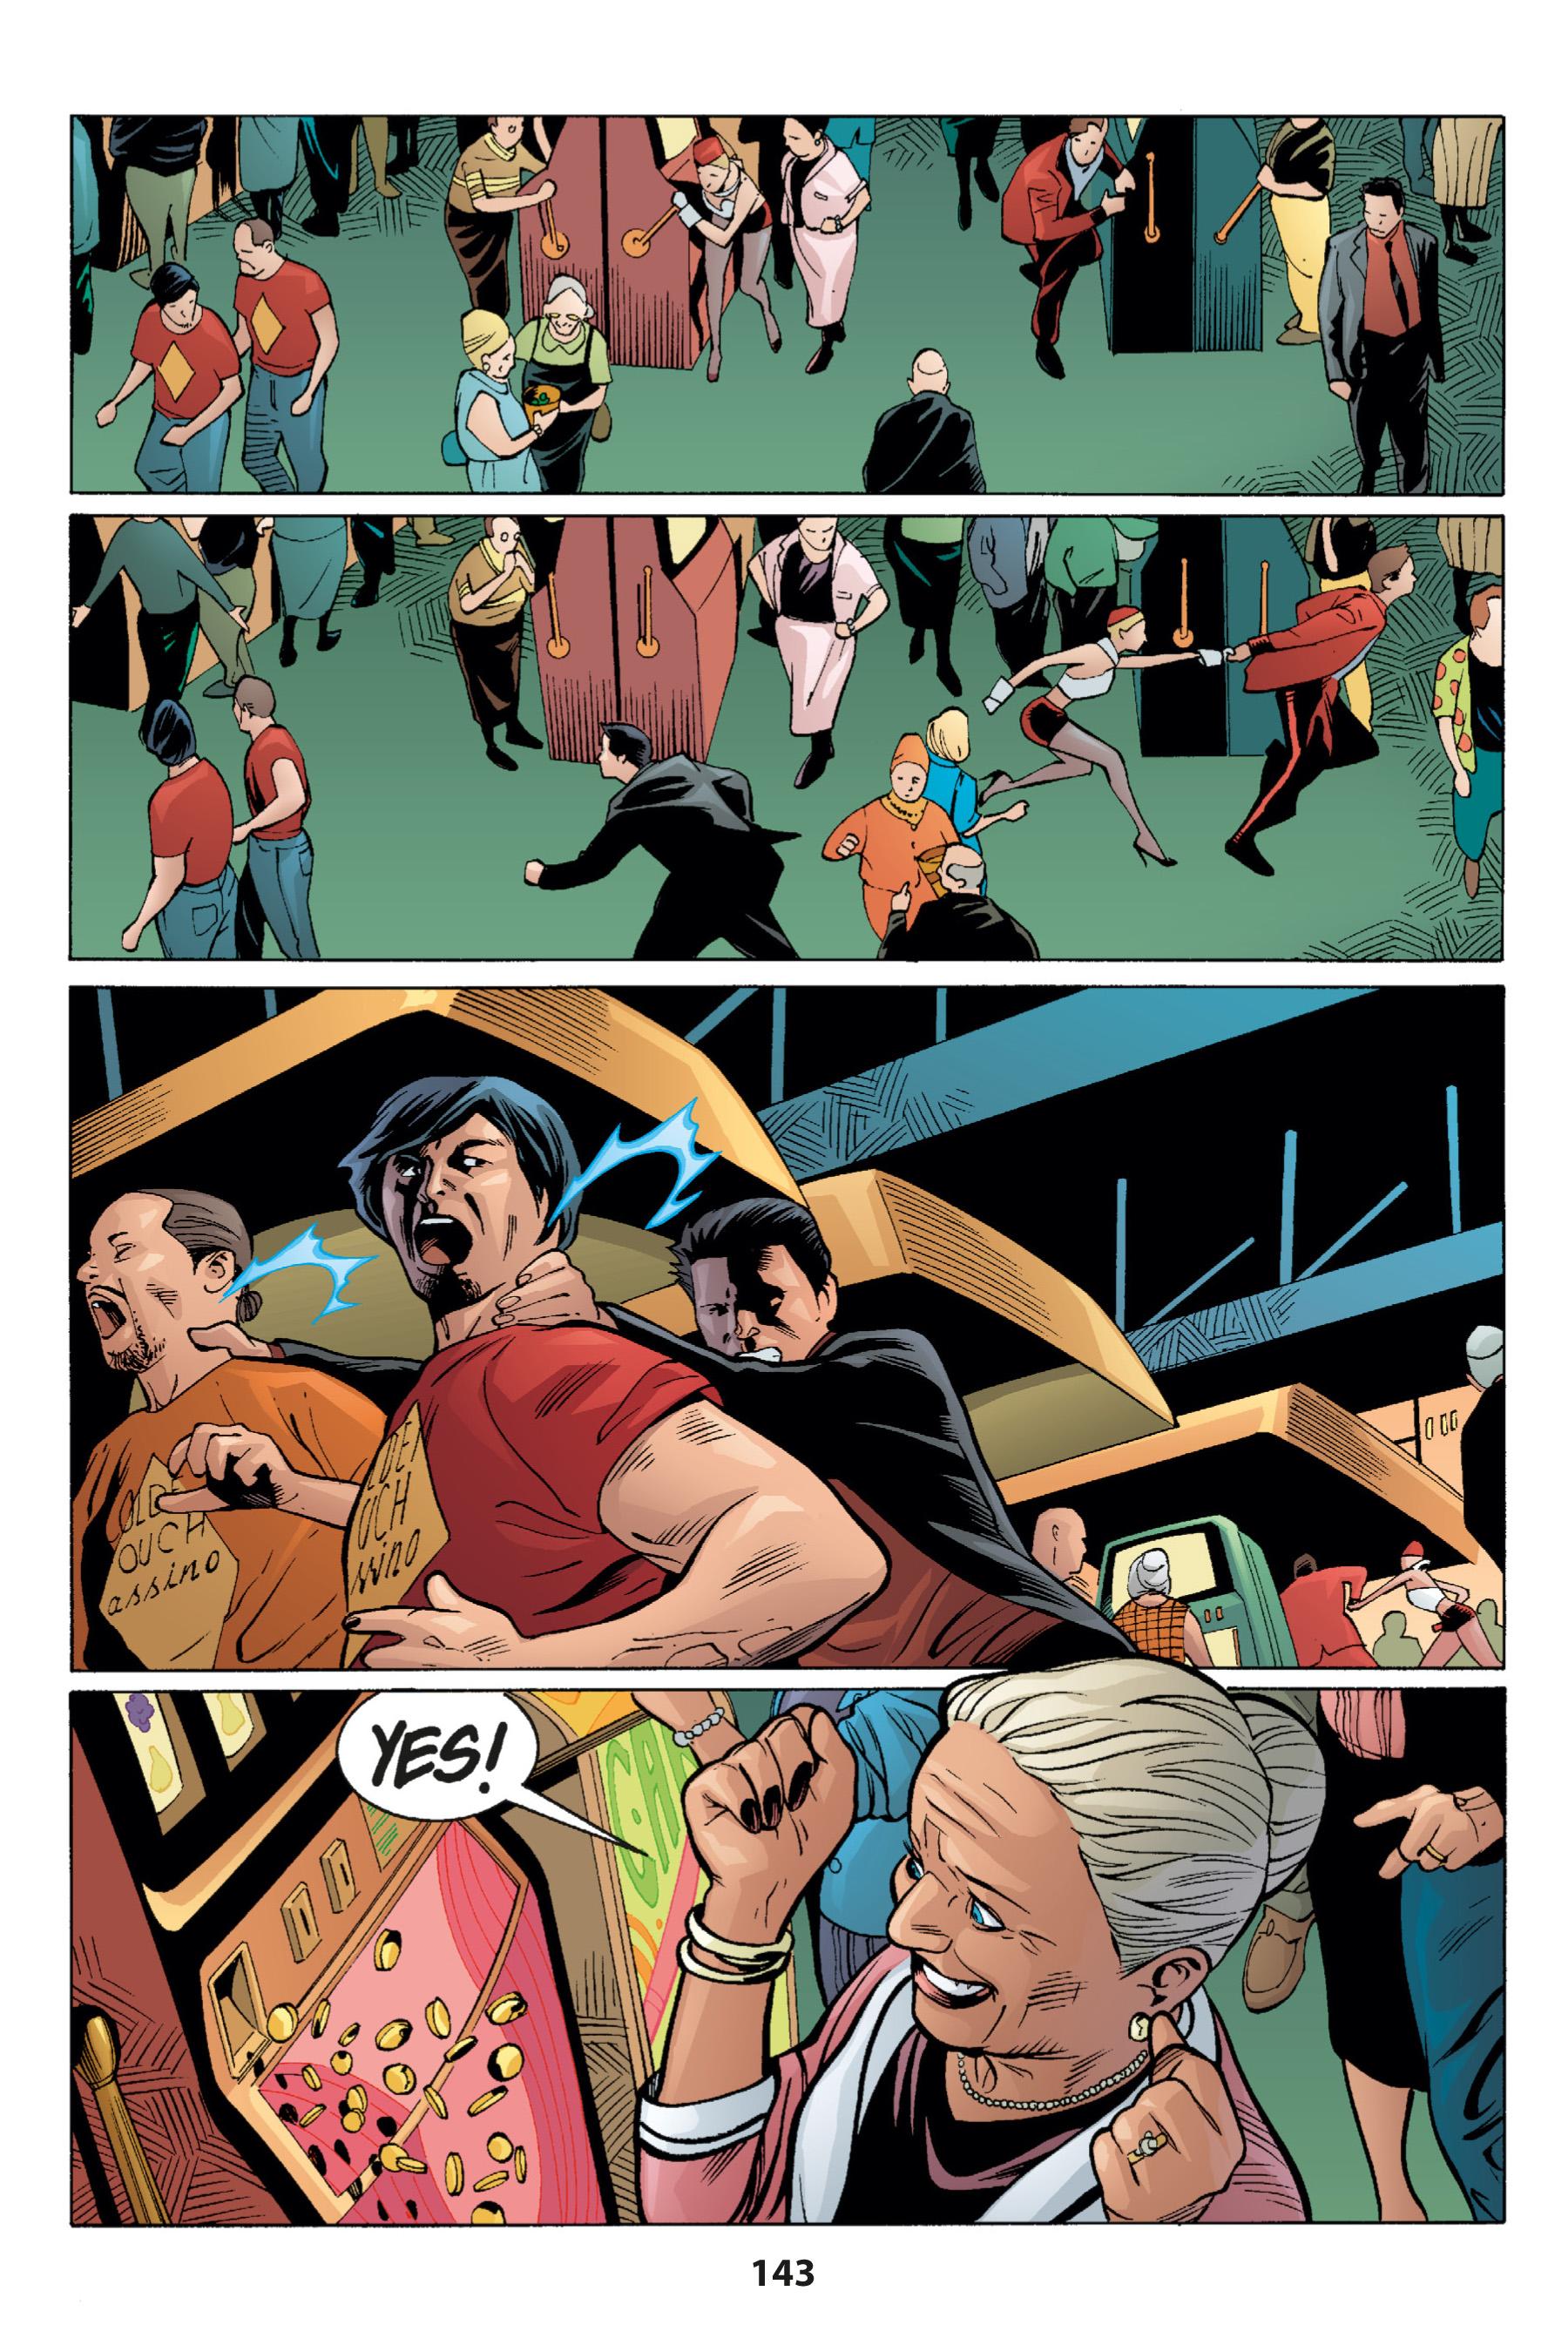 Read online Buffy the Vampire Slayer: Omnibus comic -  Issue # TPB 1 - 142